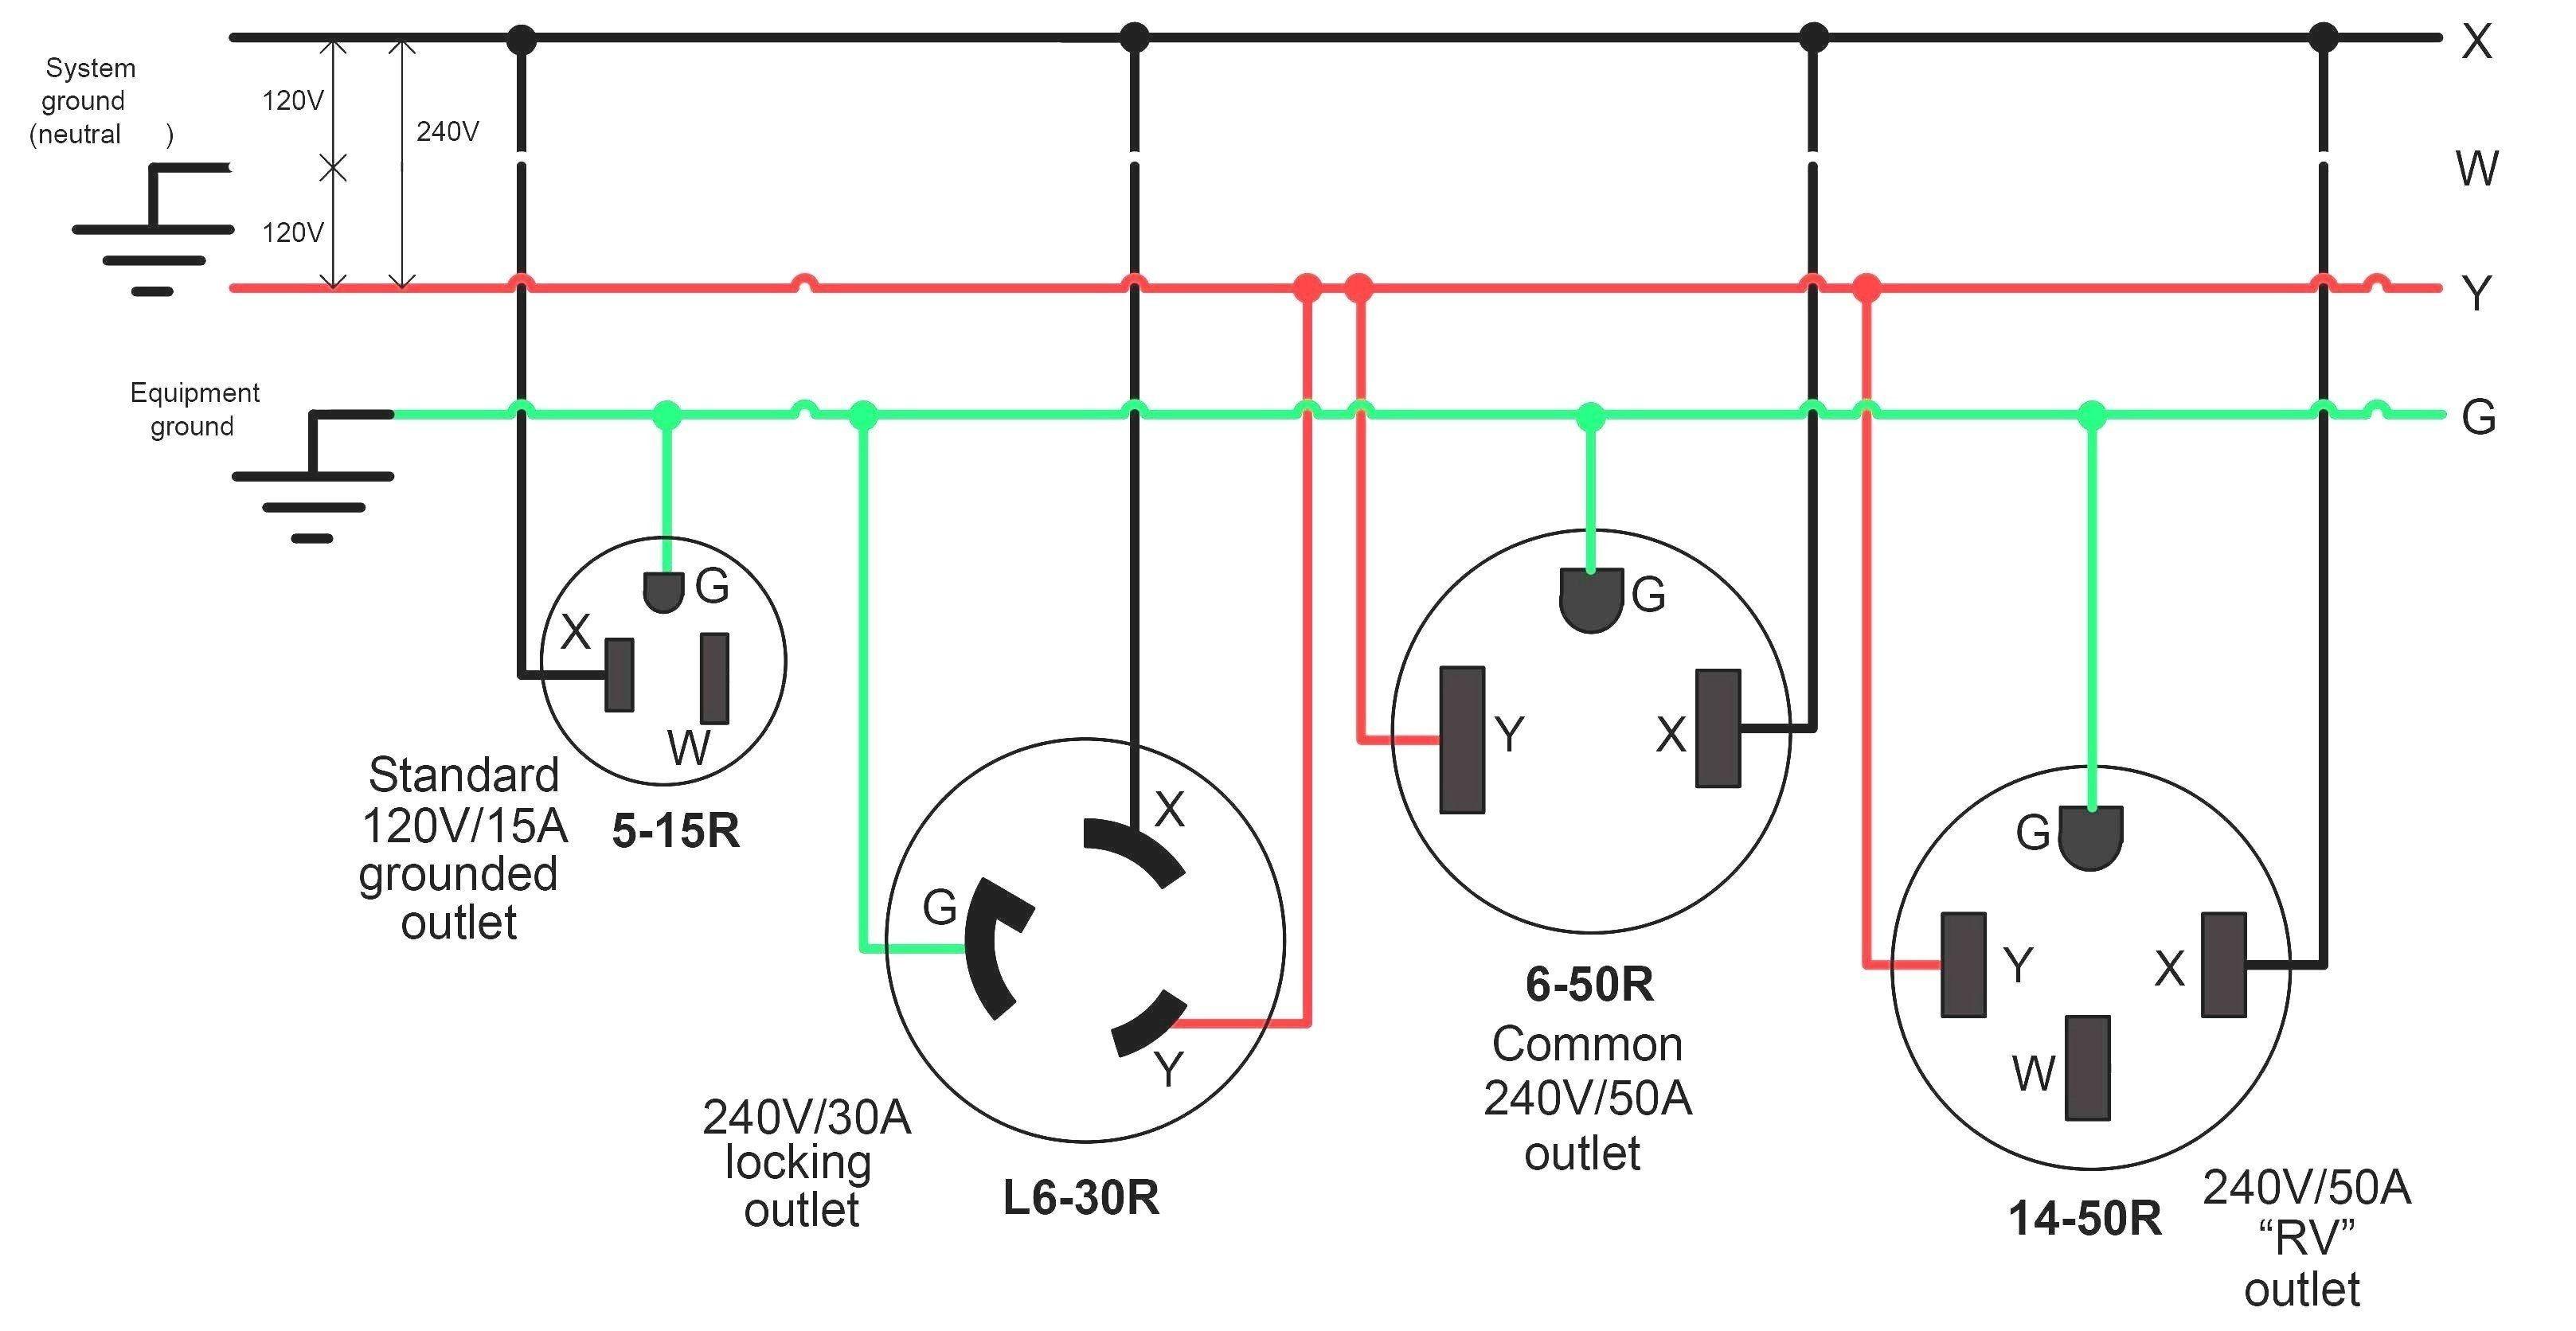 unique ac wiring color diagram wiringdiagram diagramming diagramm visuals visualisation [ 3235 x 1672 Pixel ]